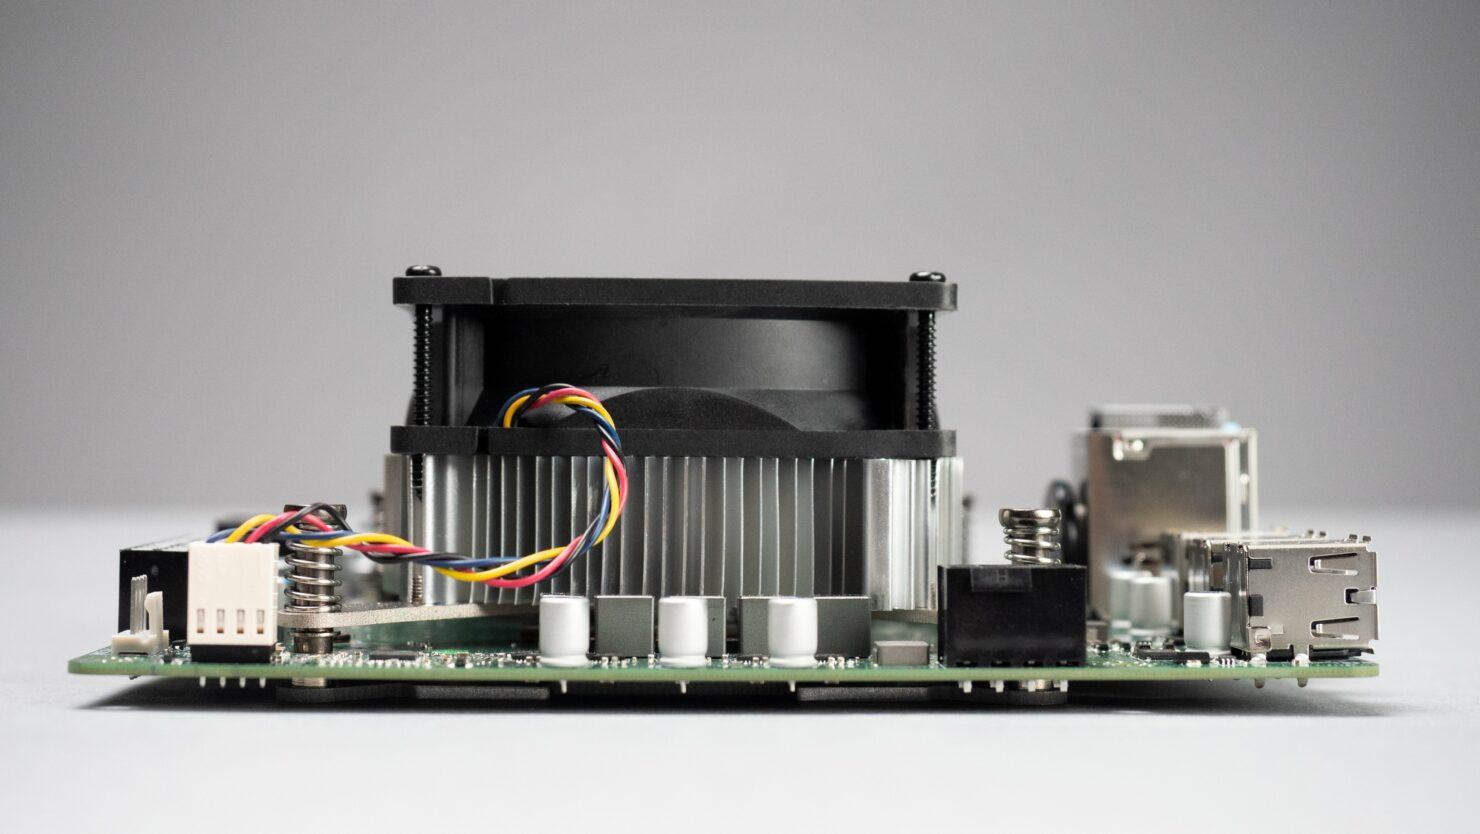 amd-4700s-desktop-pc-kit-xbox-series-x-apu_6